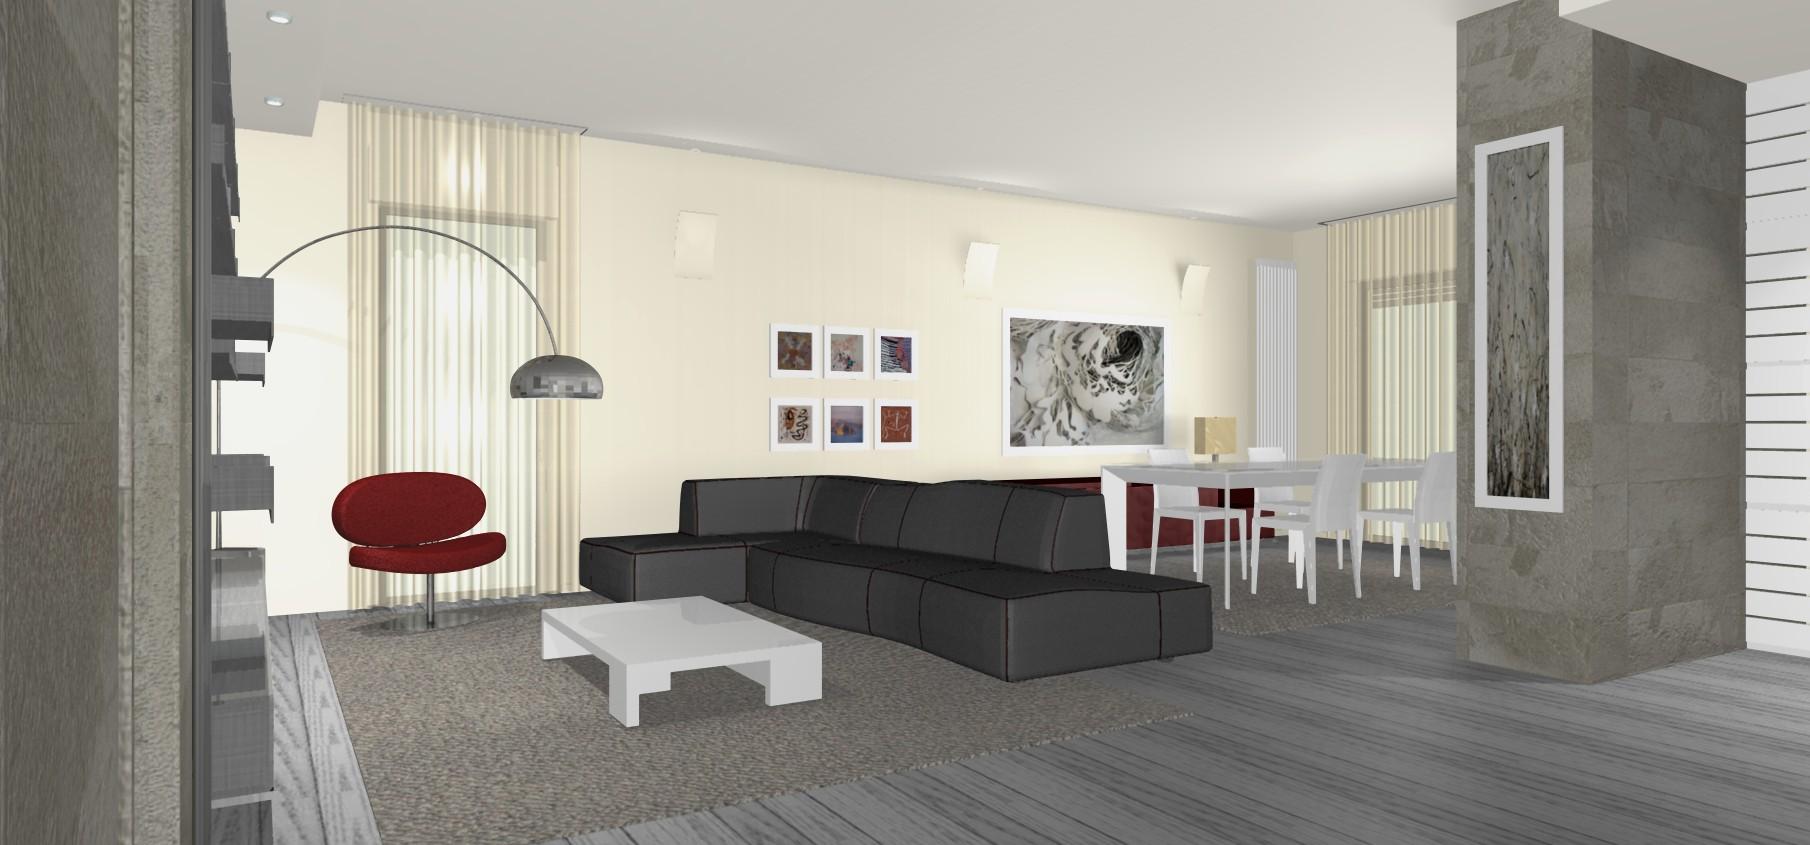 Pitture Moderne Per Interni: Idee appartamento moderno ...